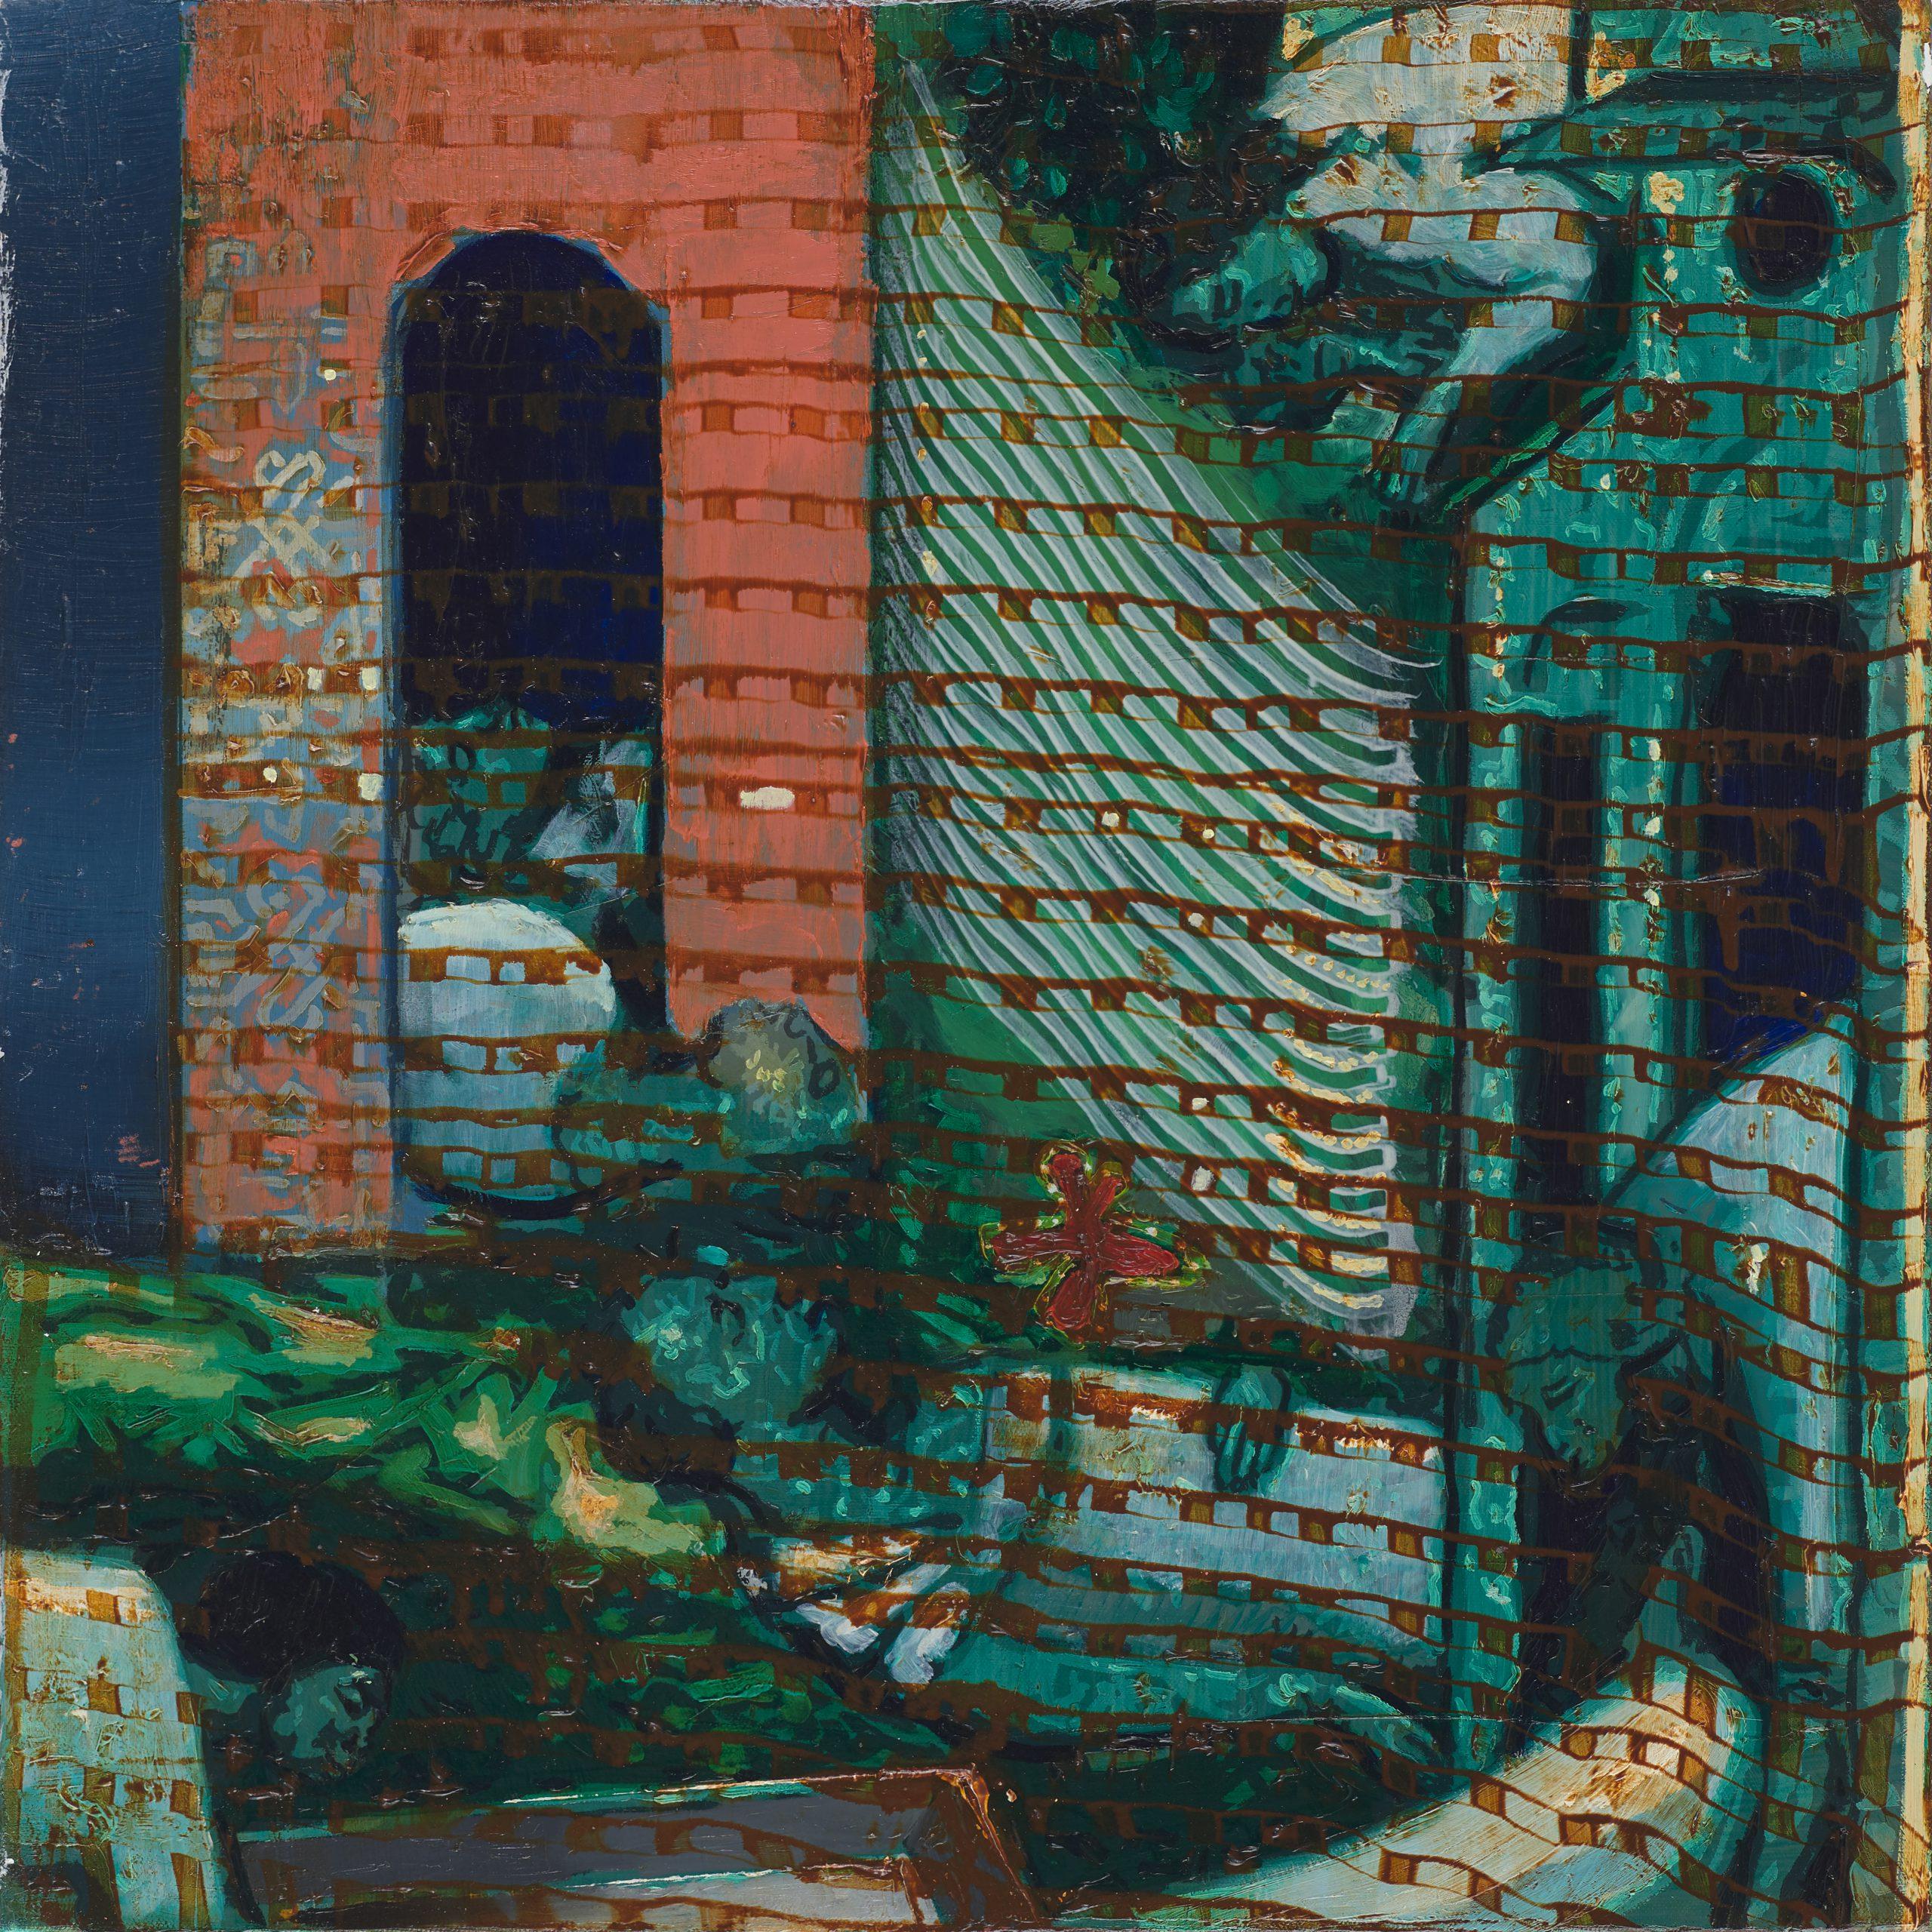 Oren Eliav, Elevation, 2019, oil on canvas, 50 x 50 cm